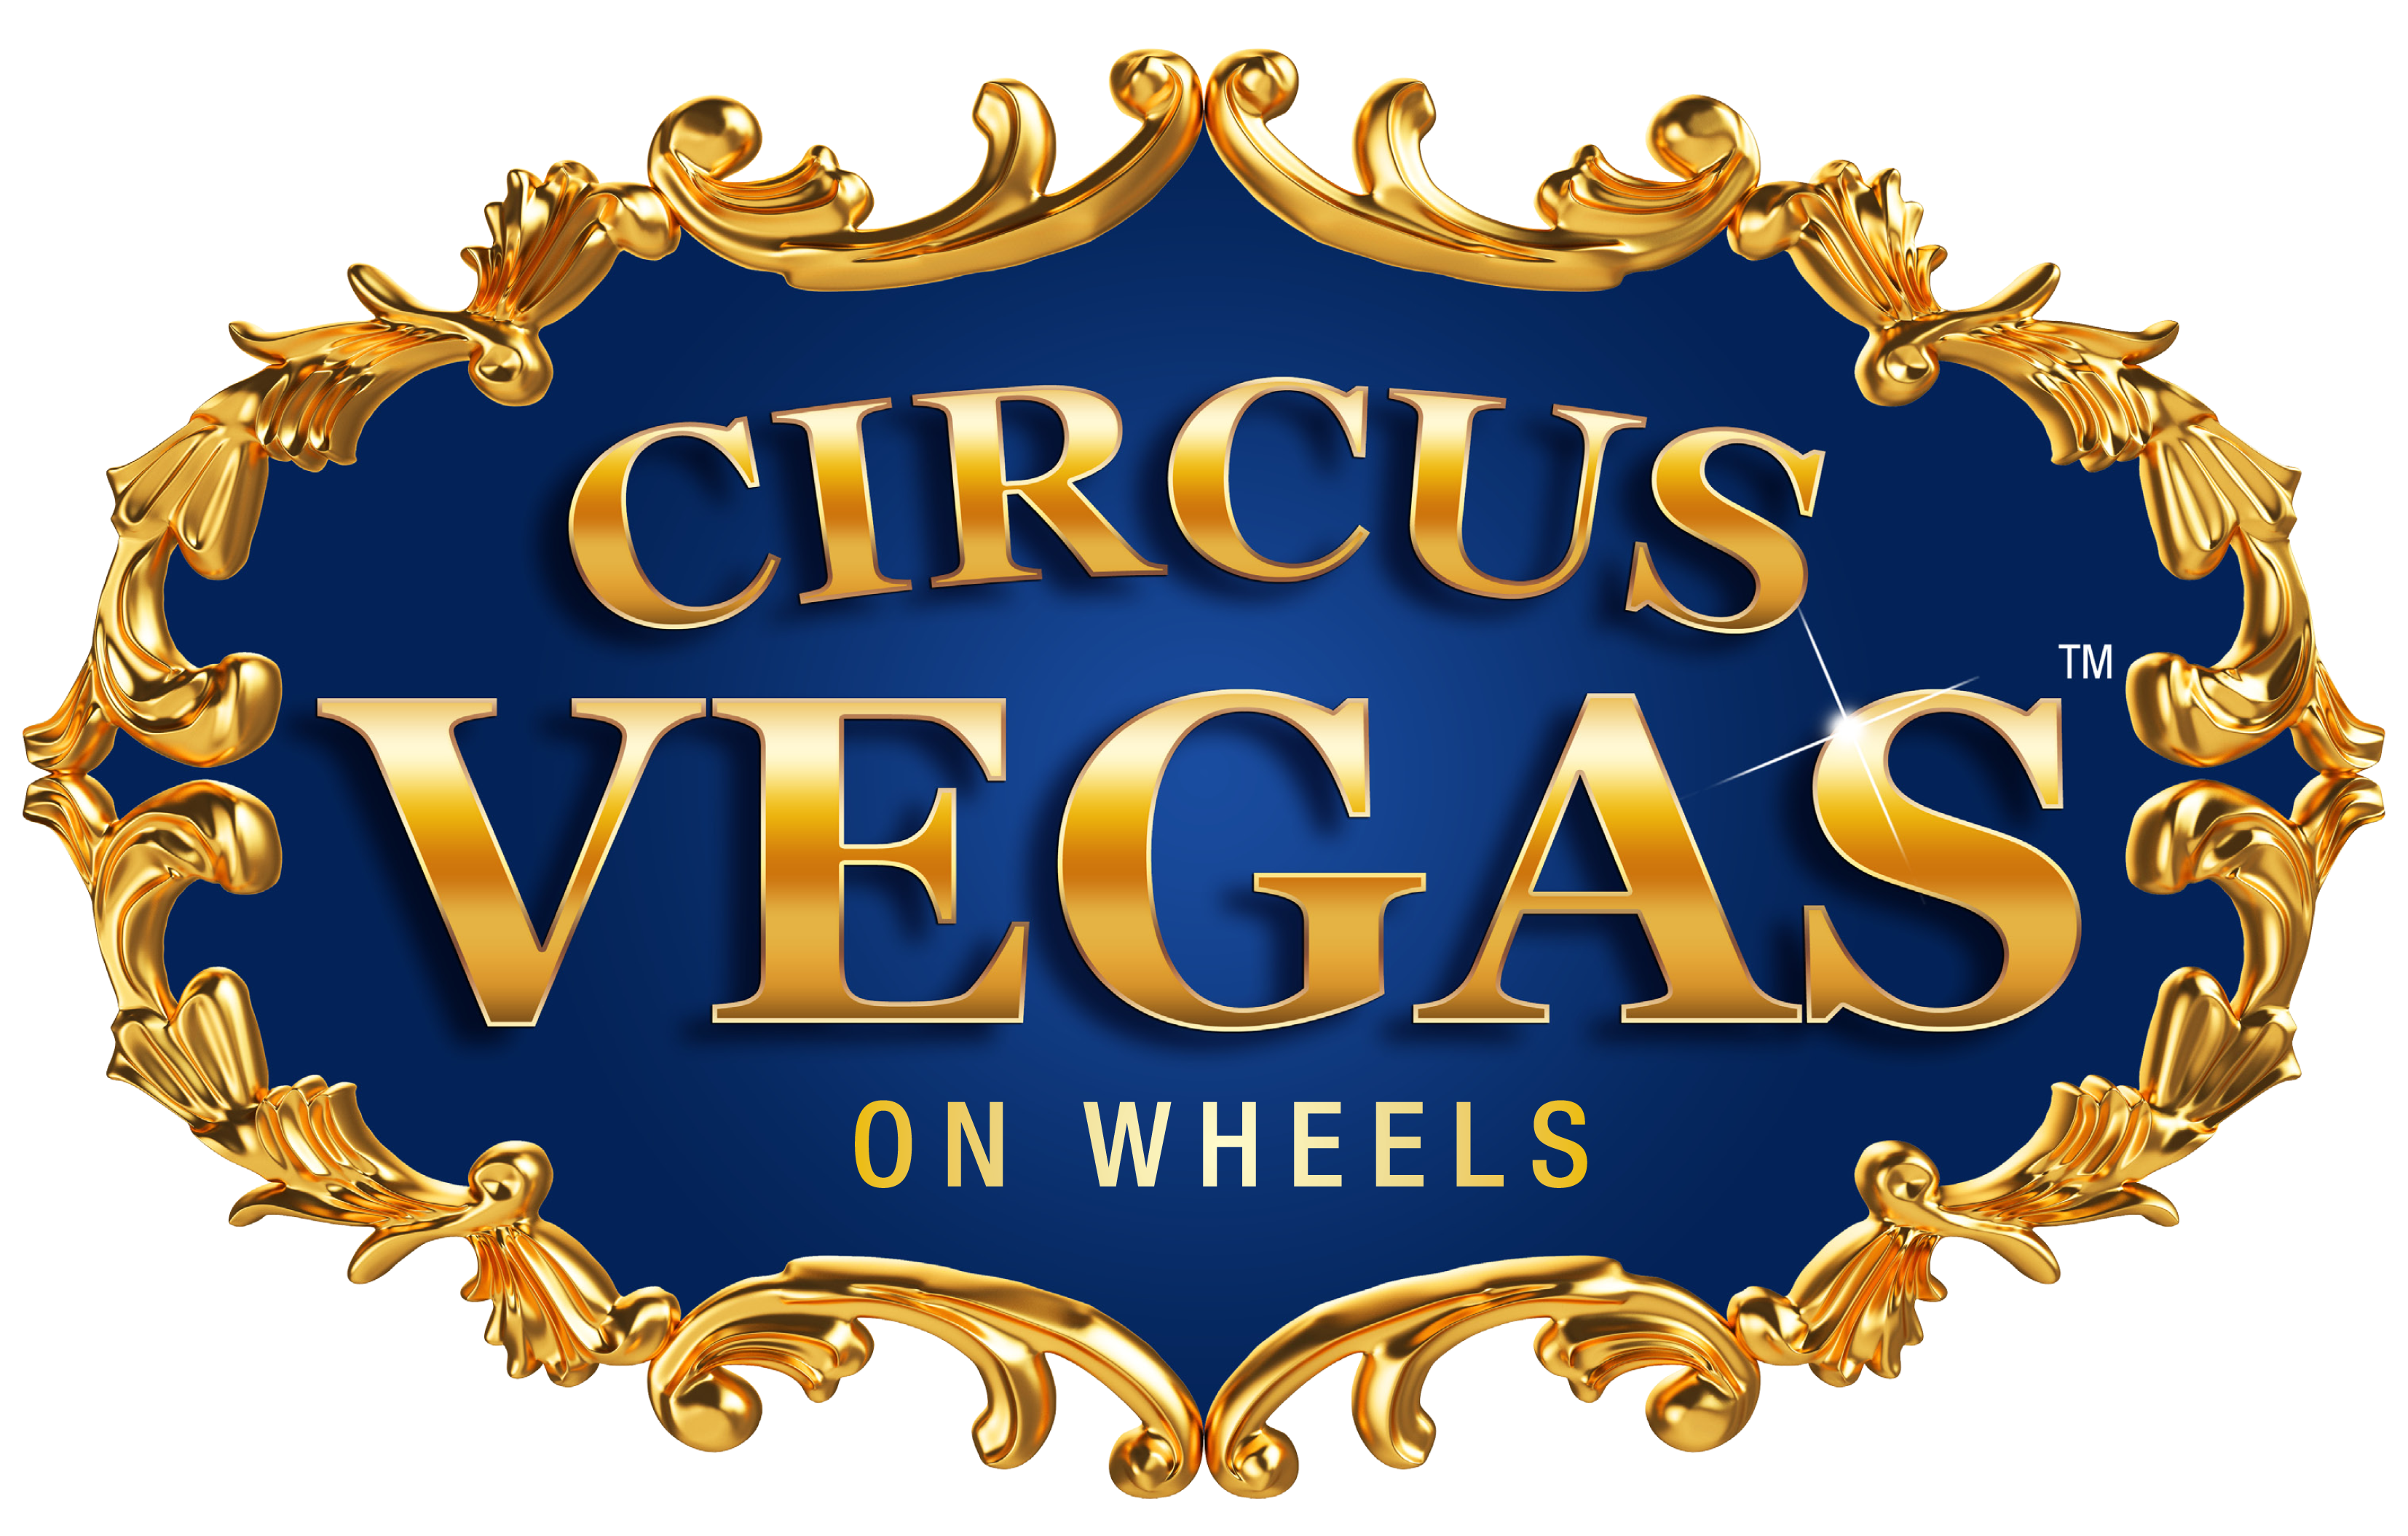 https://www.circusvegasonwheels.com